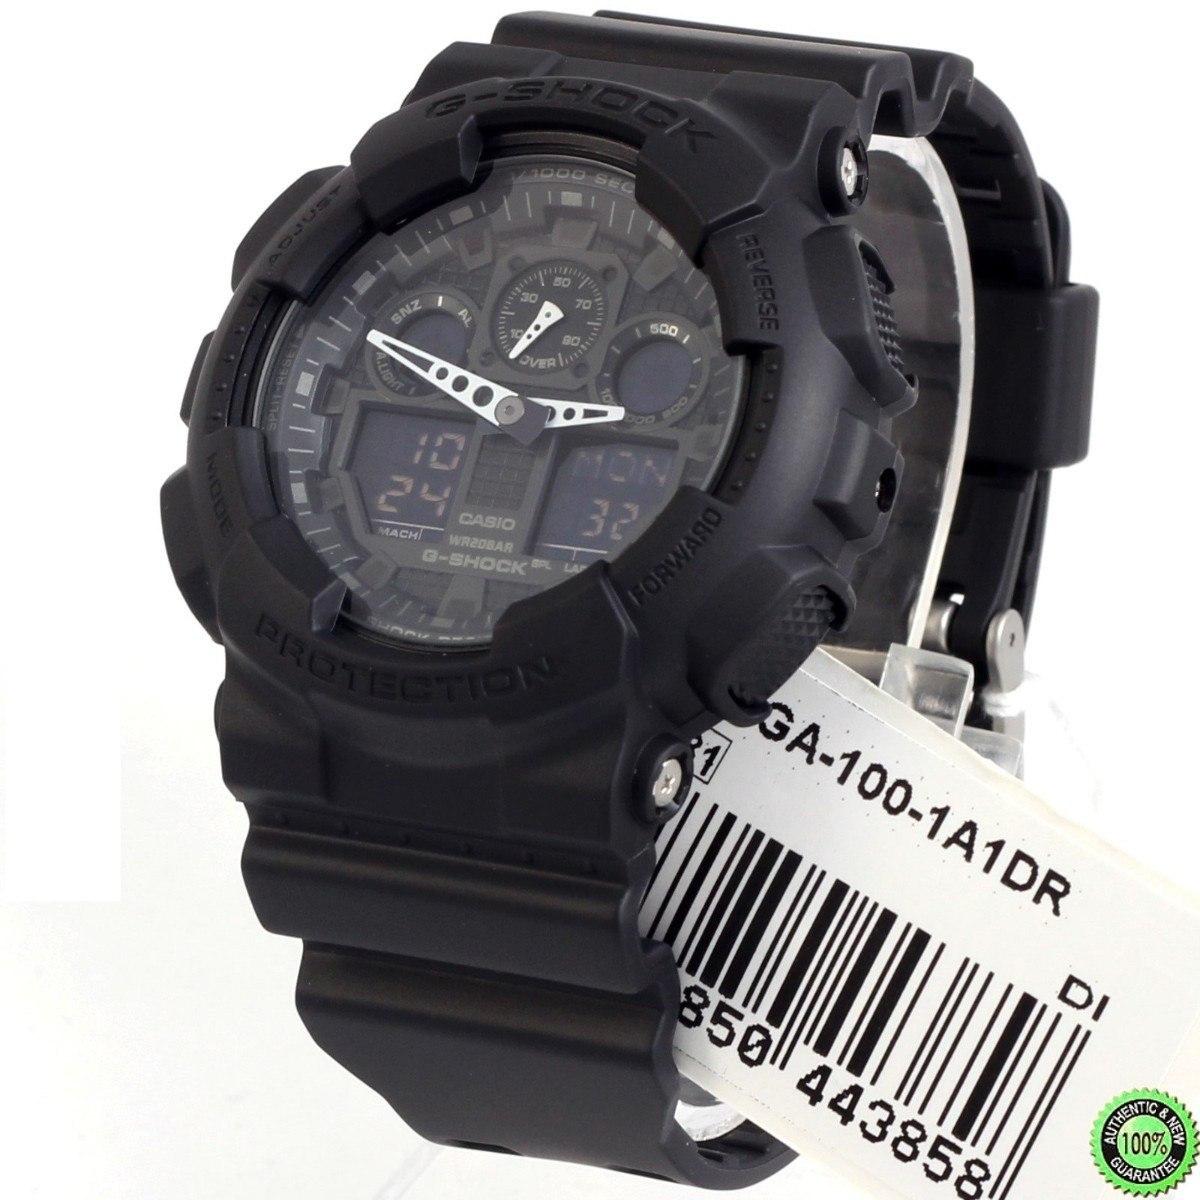 f454734dbce Relógio Casio Masculino G-shock Ga100 1a1dr Original